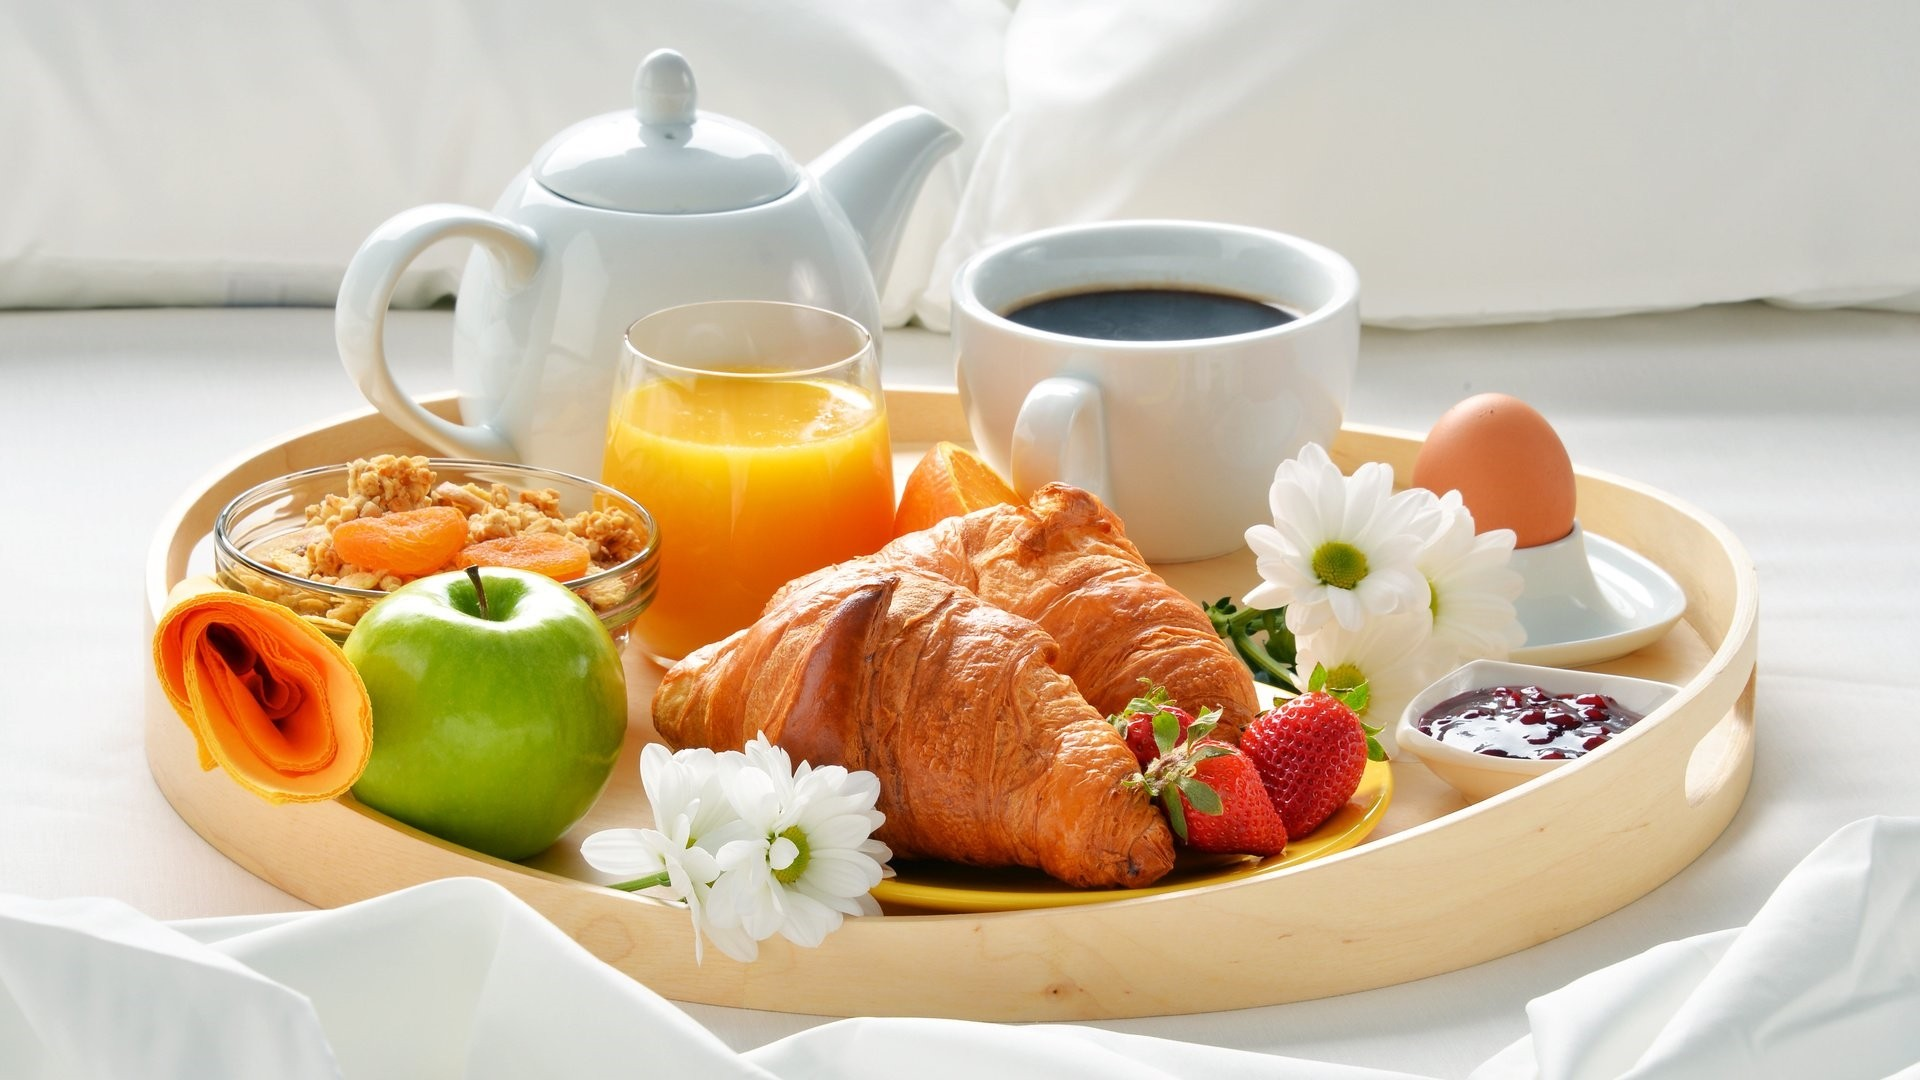 Breakfast wallpaper for computer